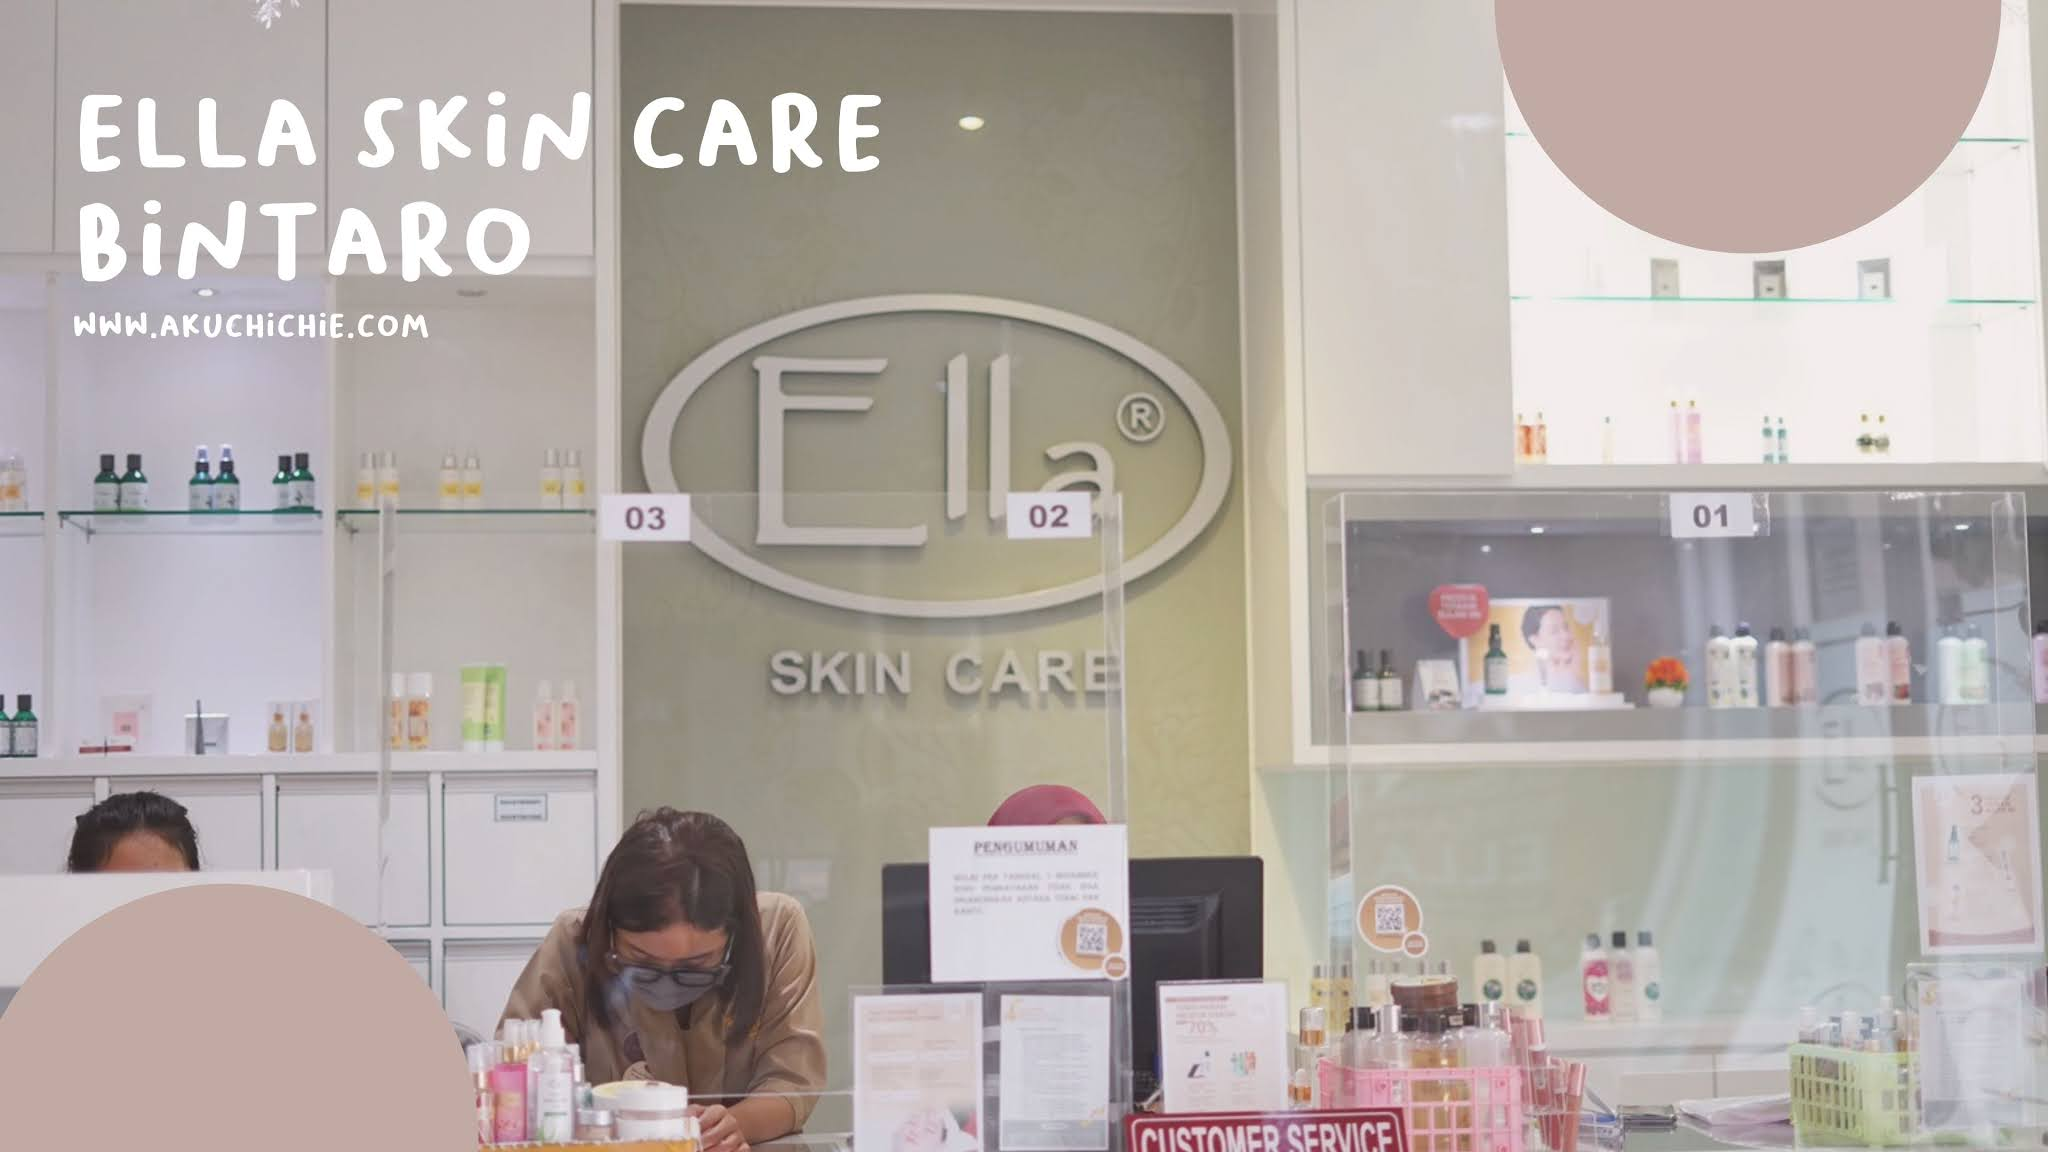 Ella Skin Care Bintaro